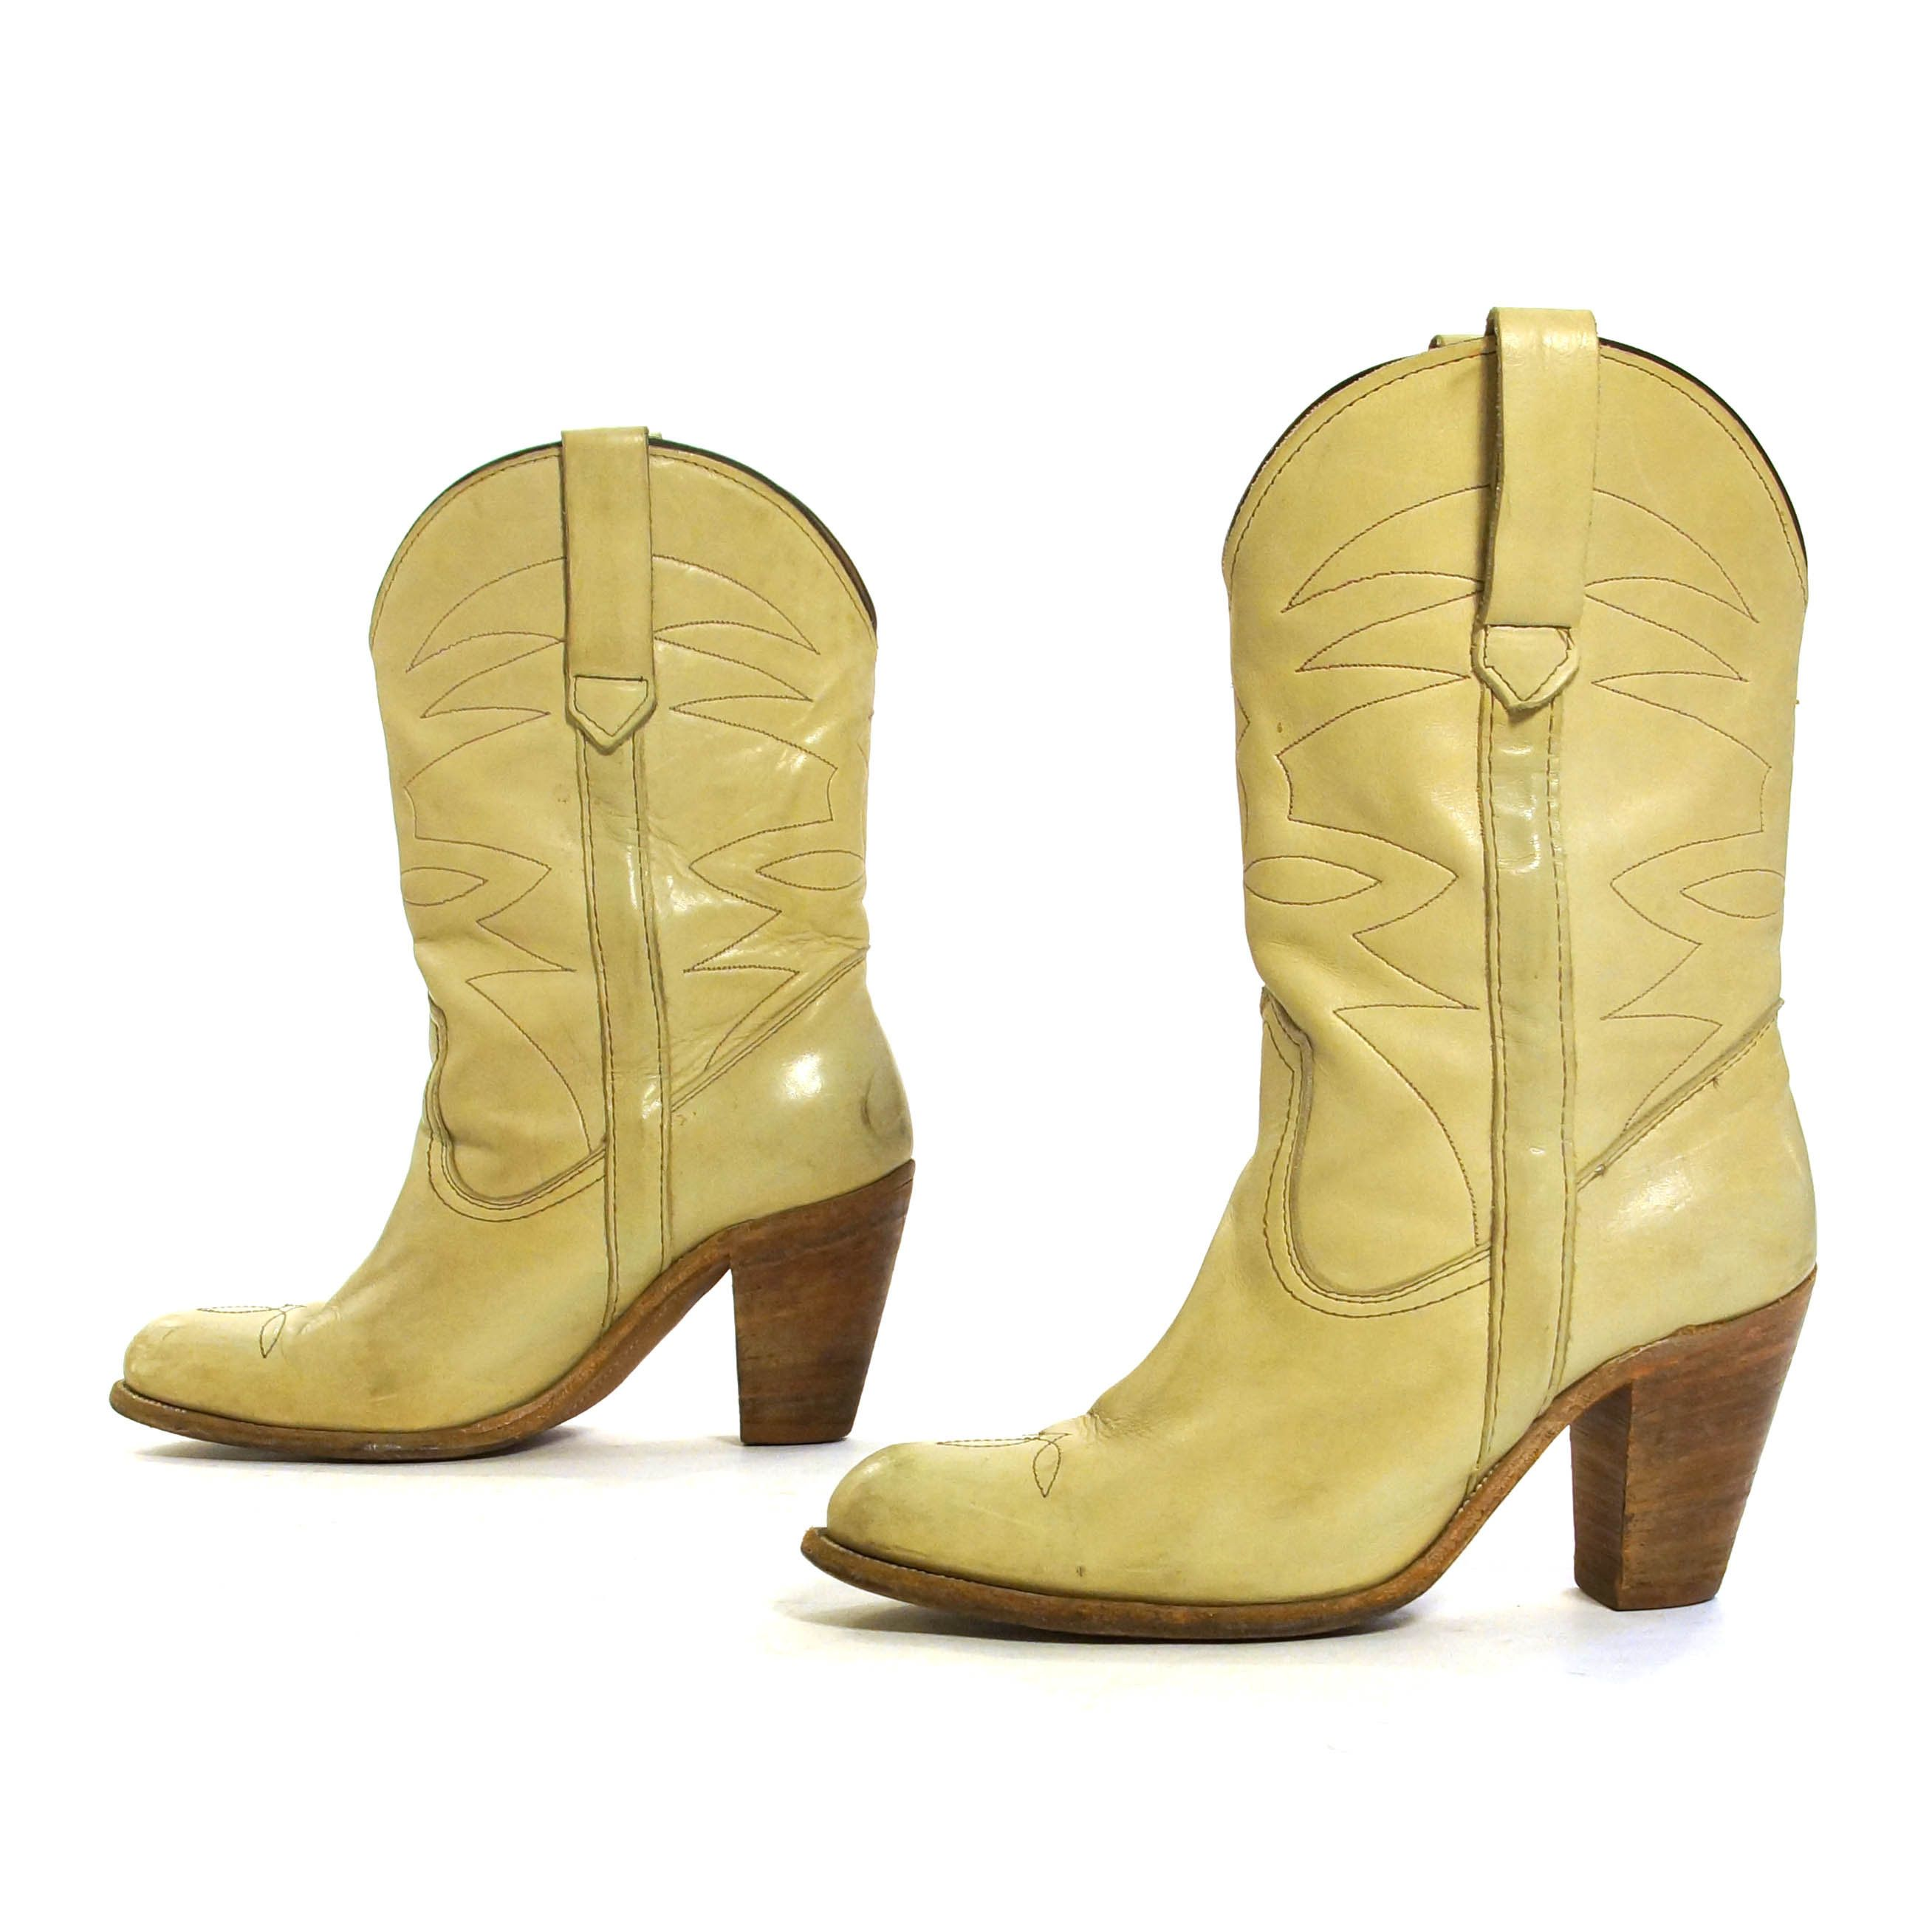 7eec1bd6710 FRYE High Heel Cowboy Boots Vintage 70s Embroidered Distressed Off ...